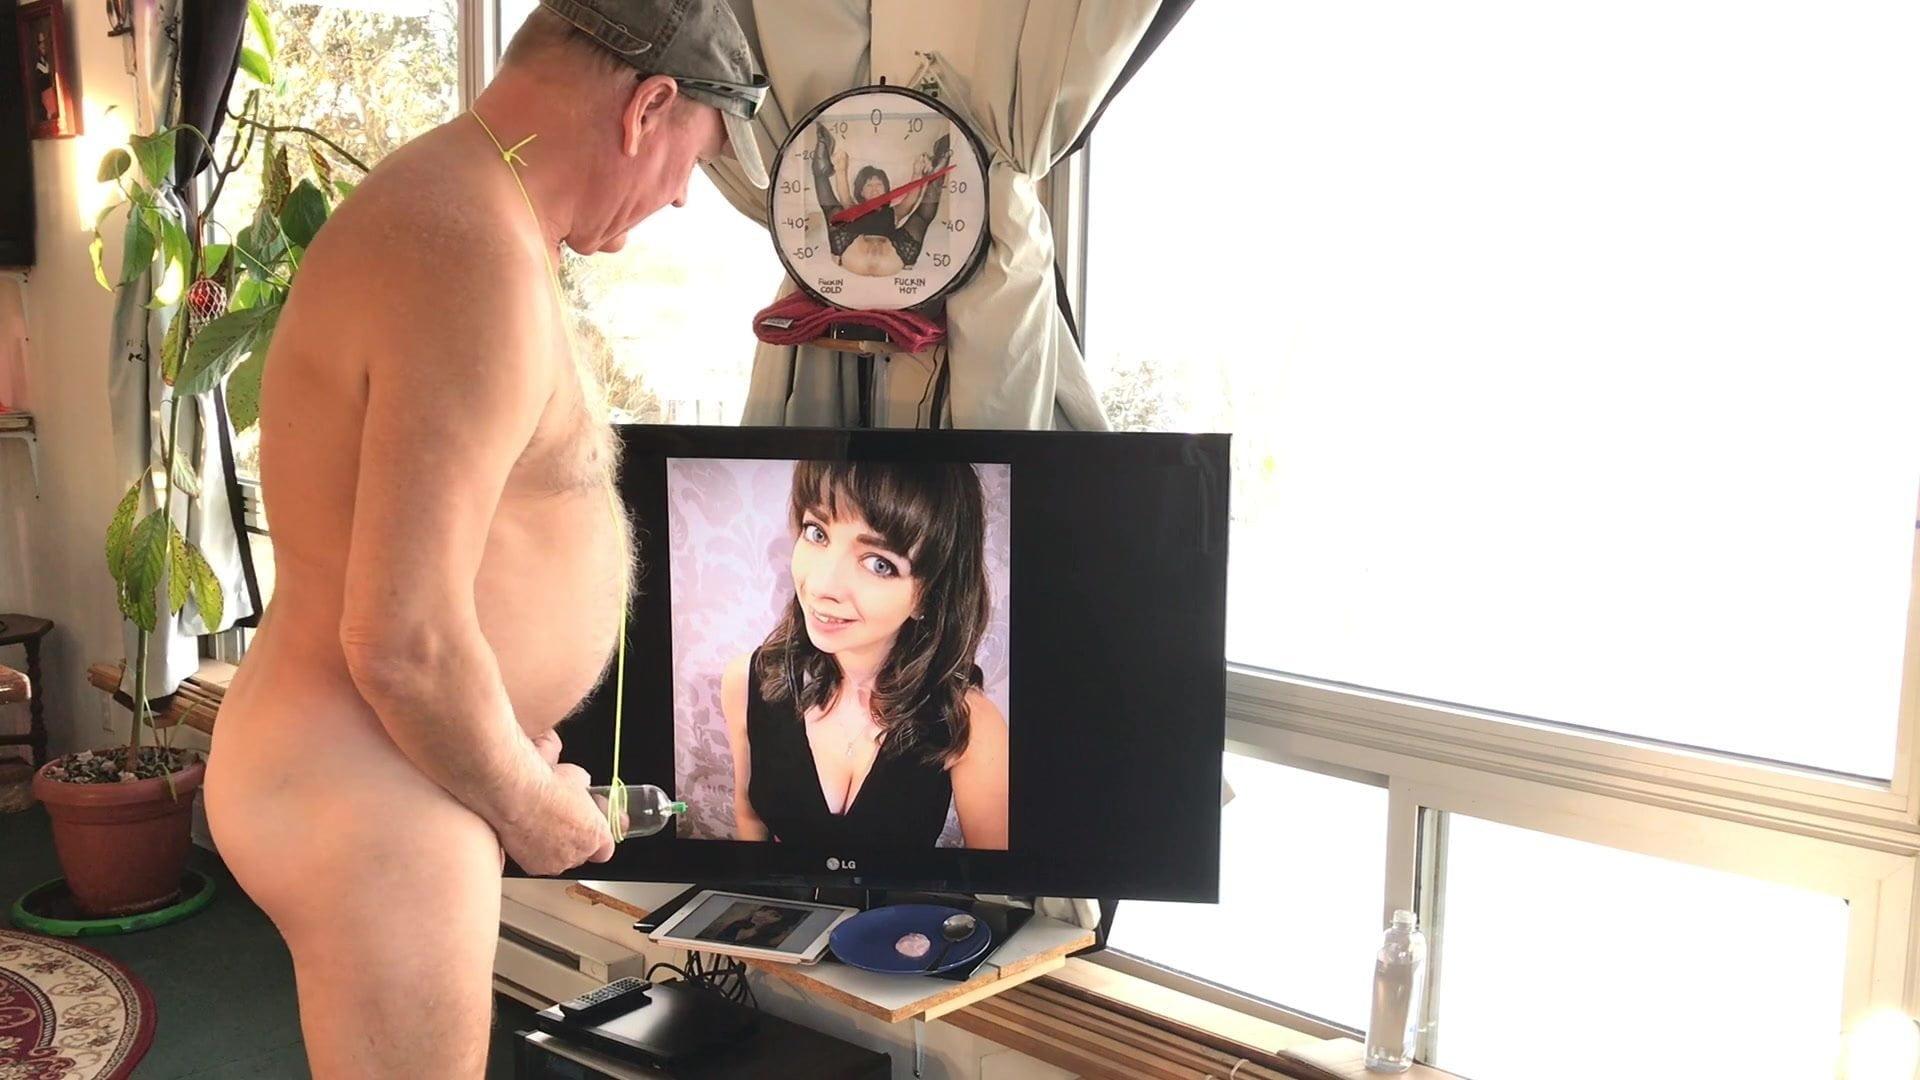 dennis the mennace porn